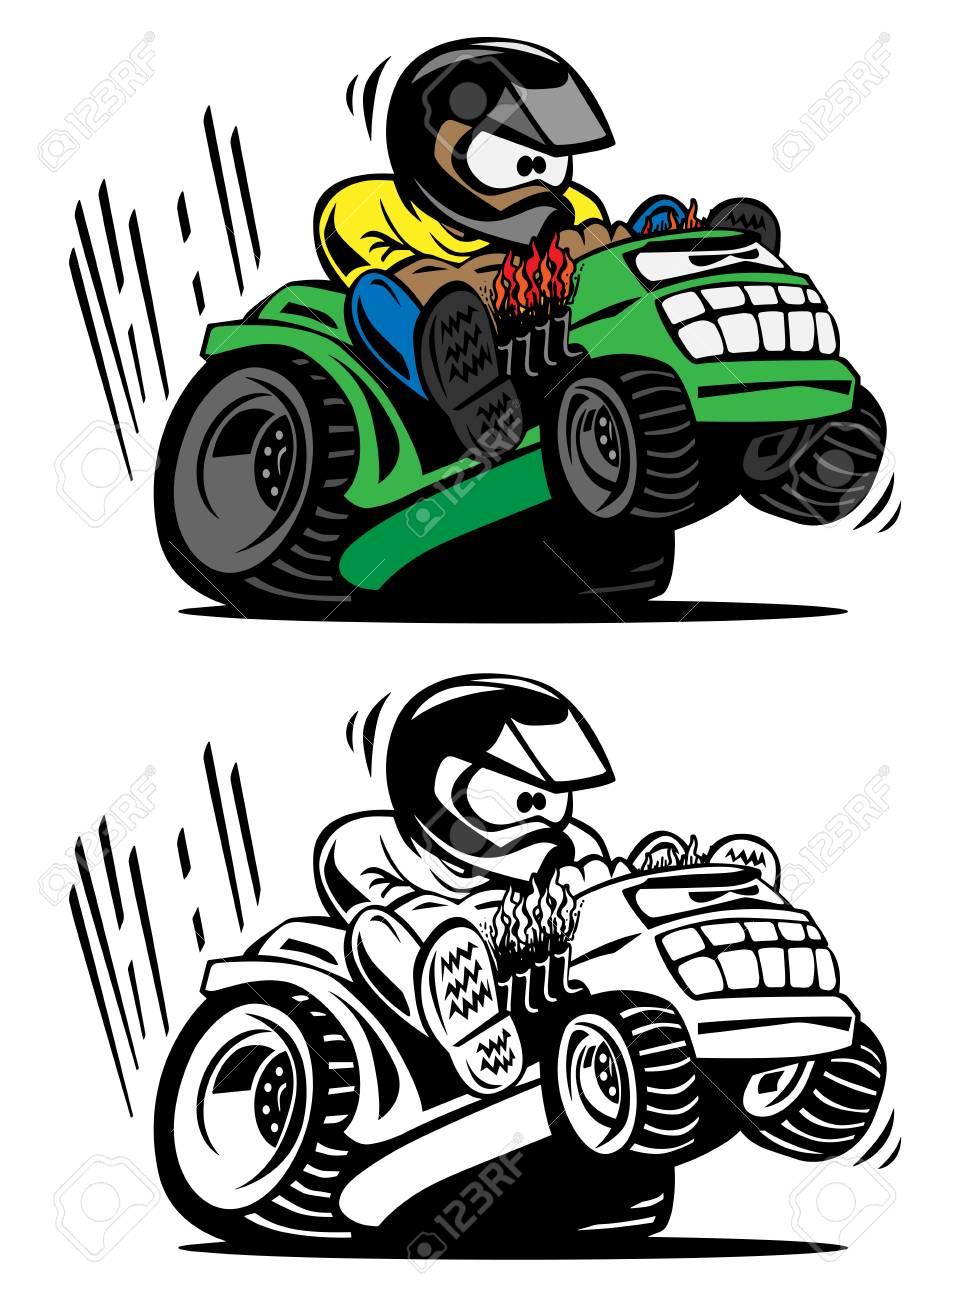 Cartoon racing lawnmower vector illustration - 98913508